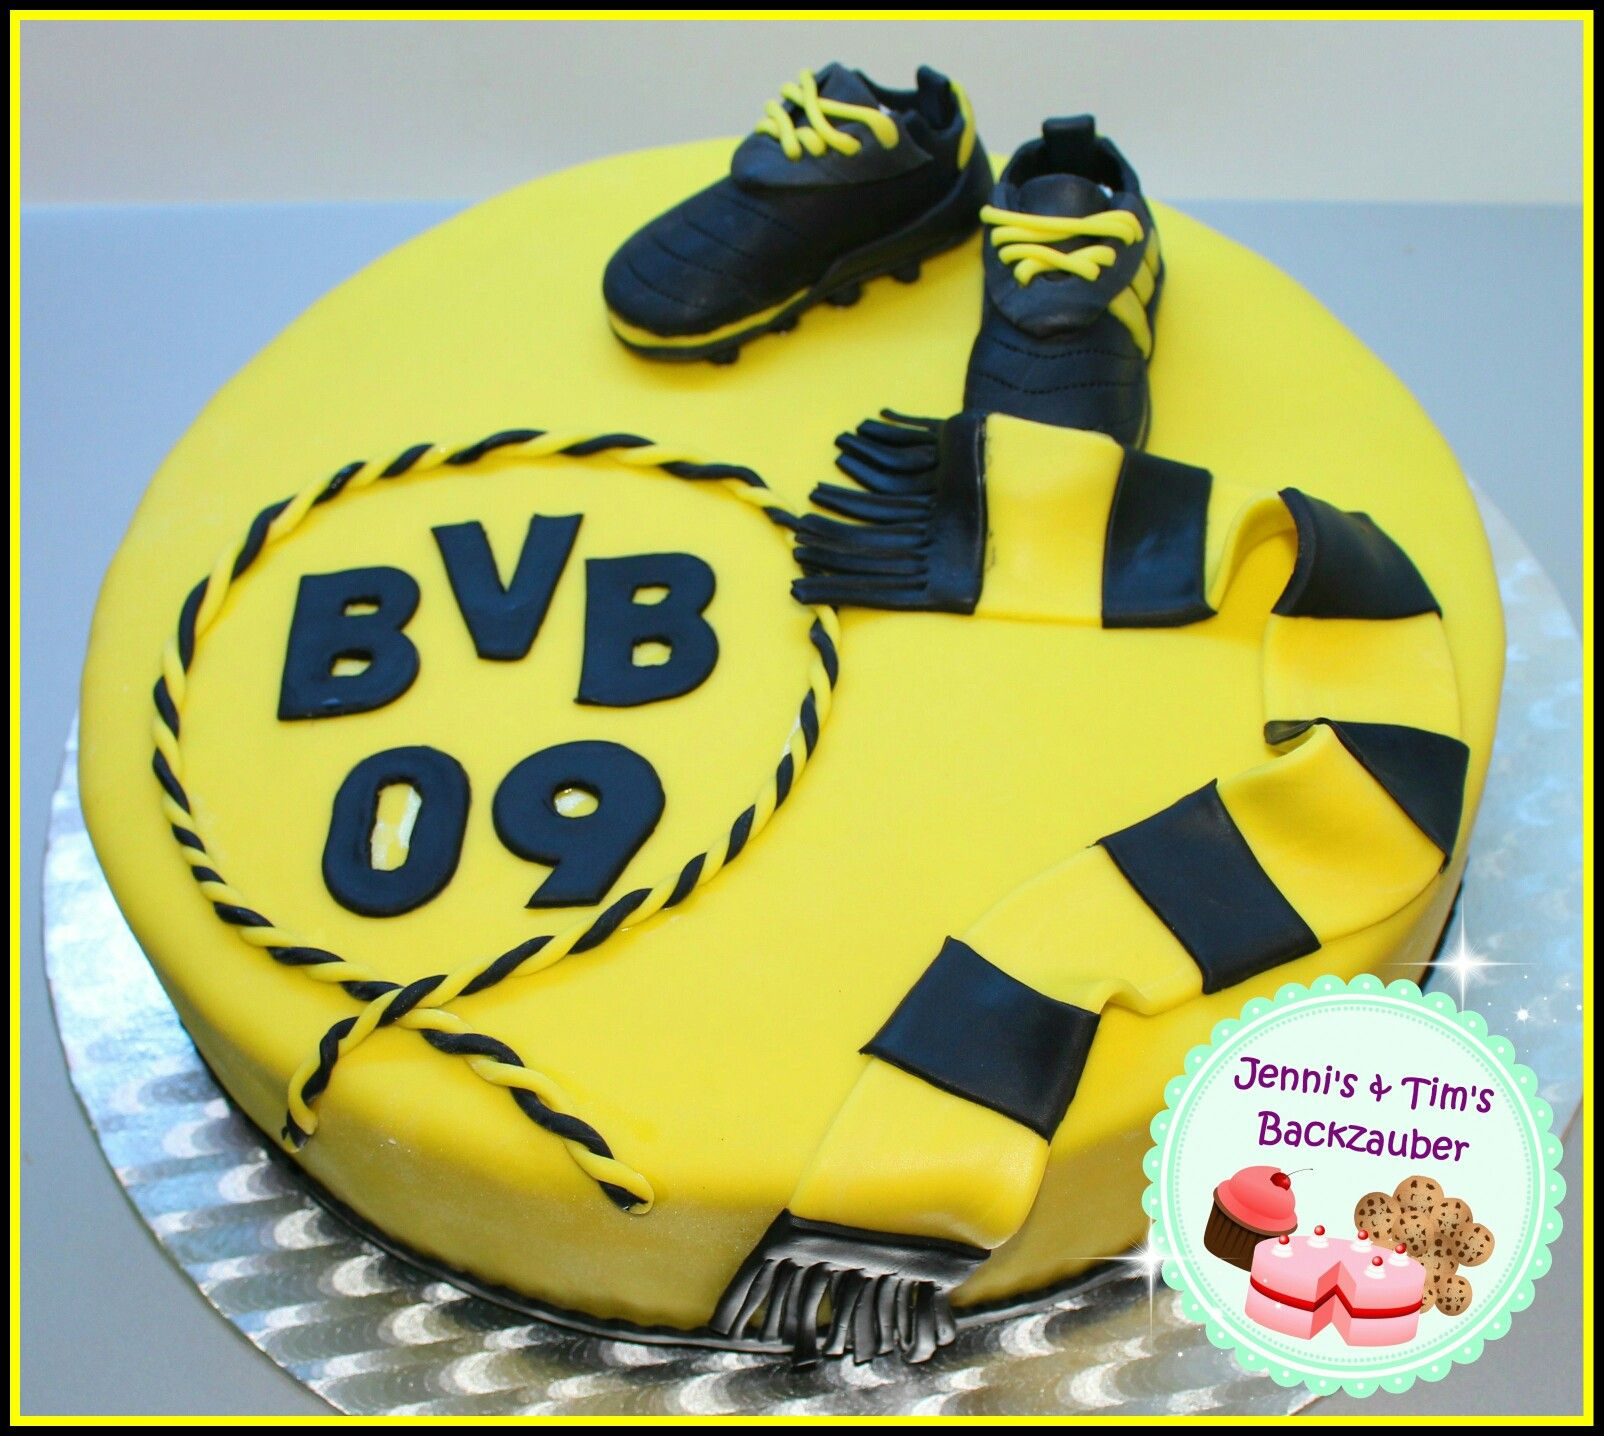 Bvb Geburtstag